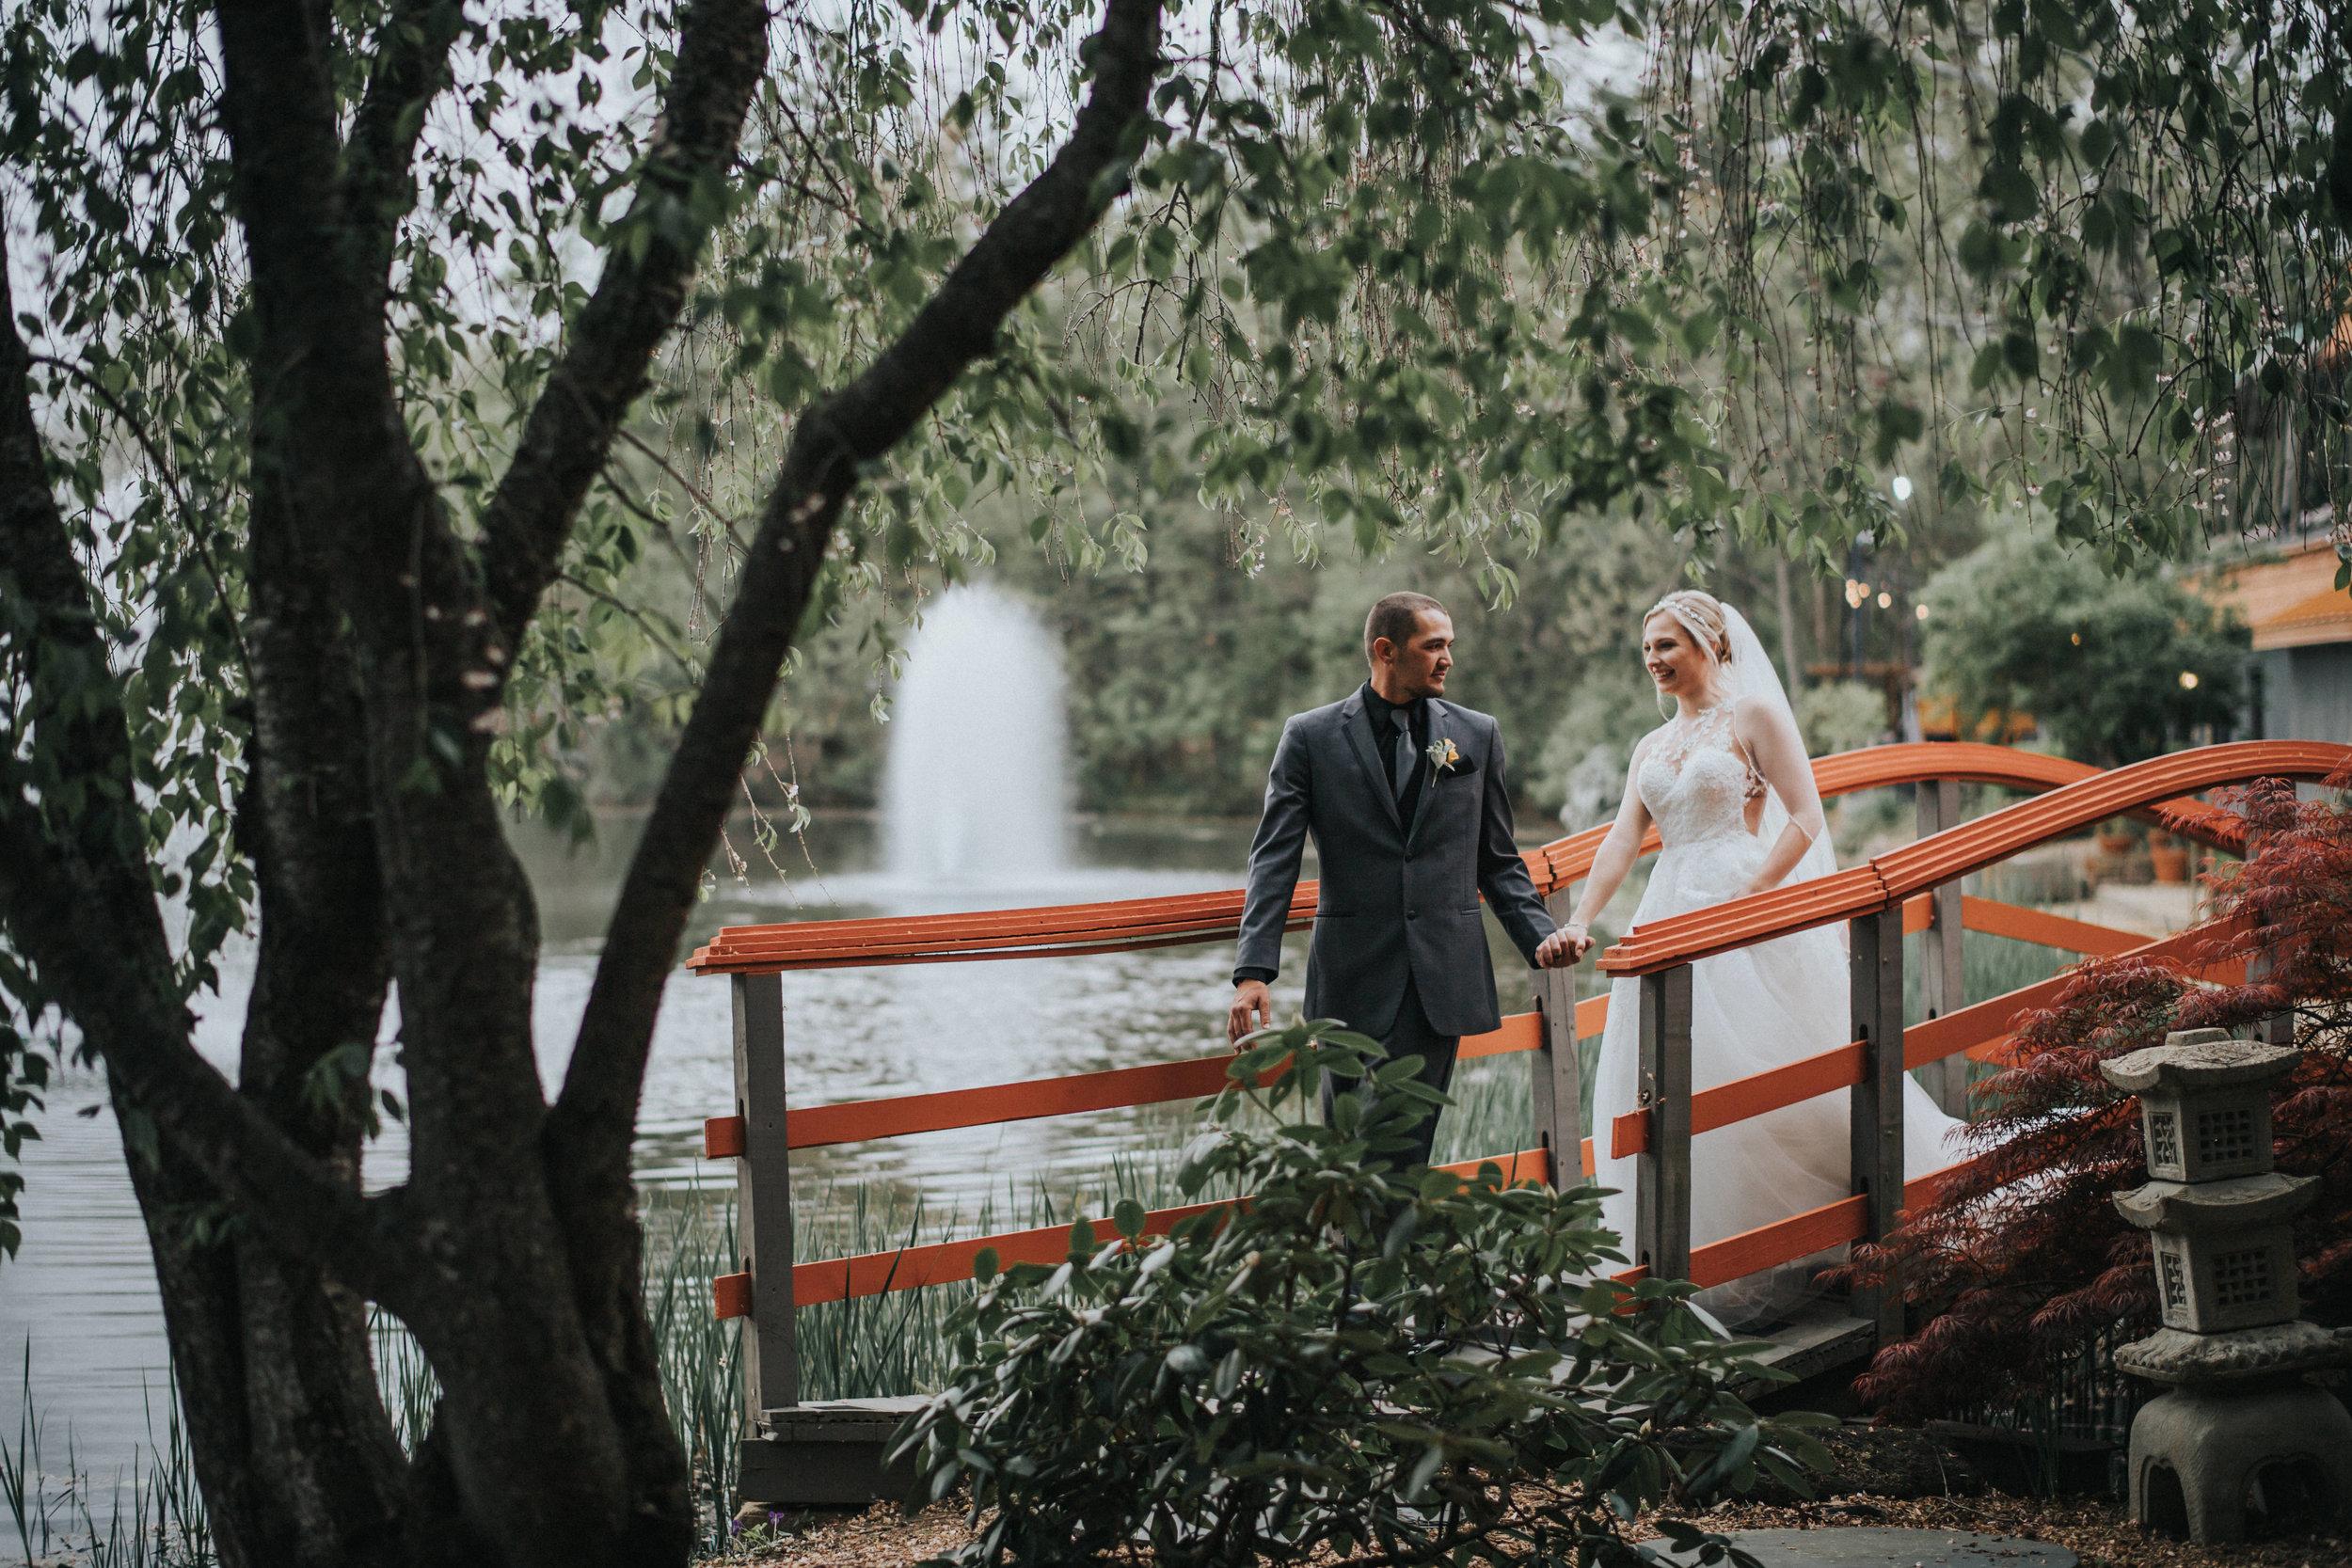 New-Jersey-Wedding-Photographer-Megan&Nick-BrideandGroom-39.jpg